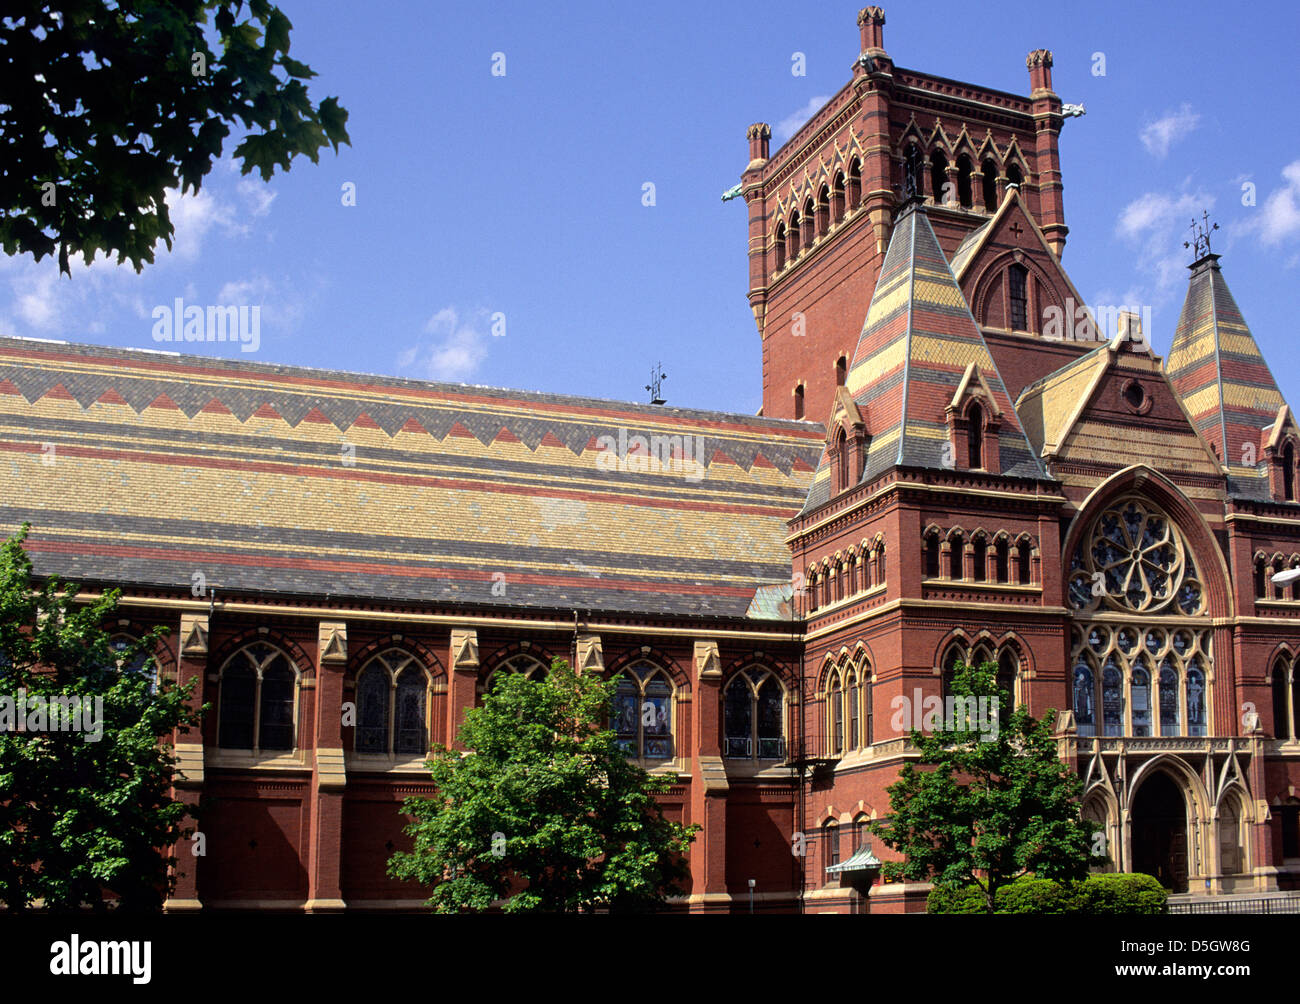 El Campus de la Universidad de Harvard Memorial Hall Cambridge Massachusetts EE.UU. Imagen De Stock